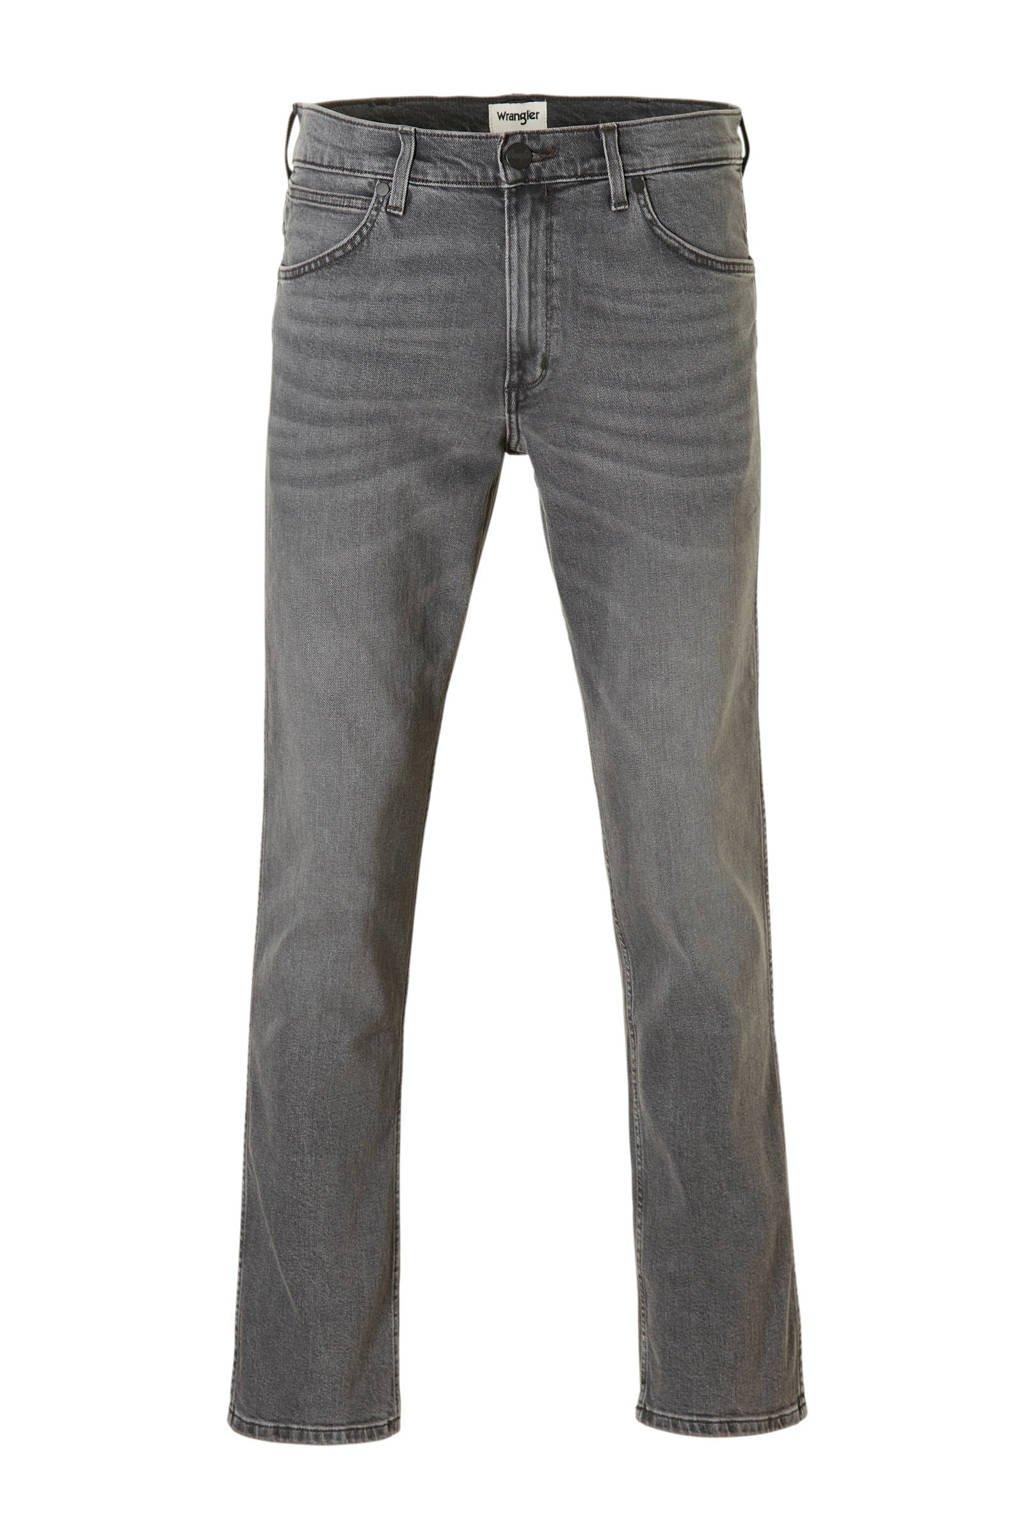 Wrangler Greensboro regular straight fit jeans, Gun Smoke